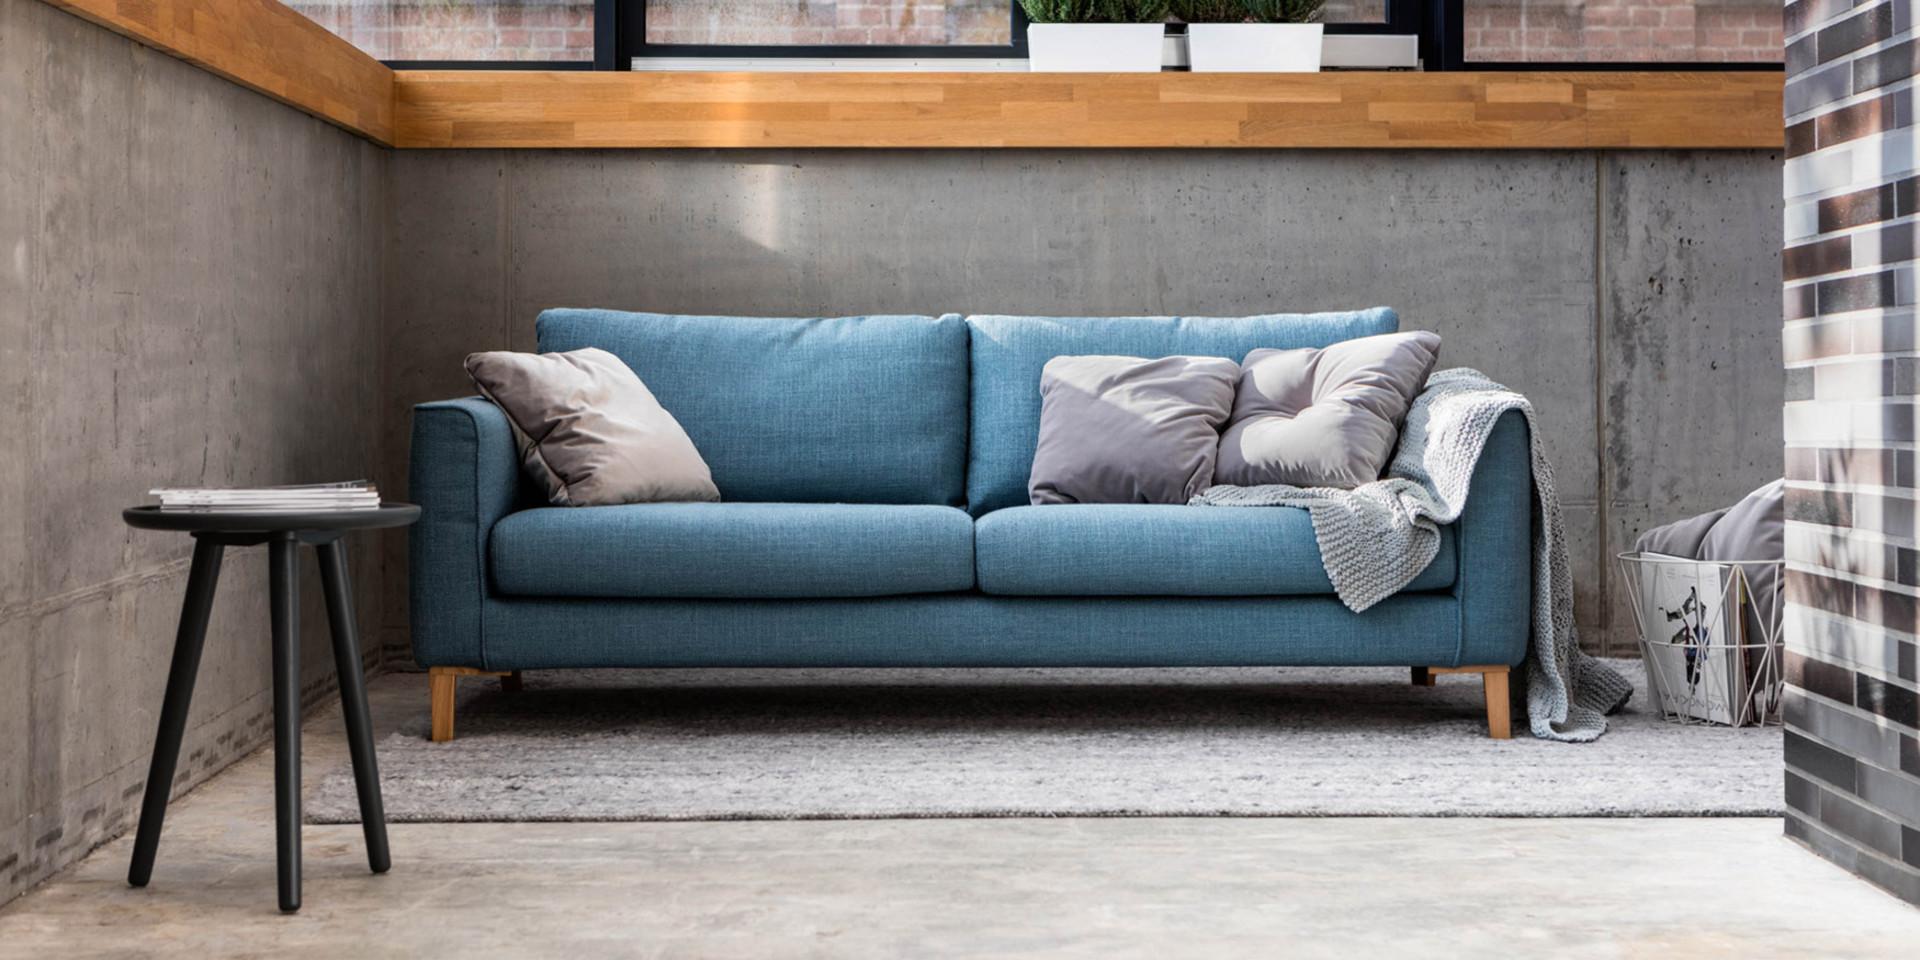 Sits RONJA arrangement_3seater_bermuda8_turquoise_3